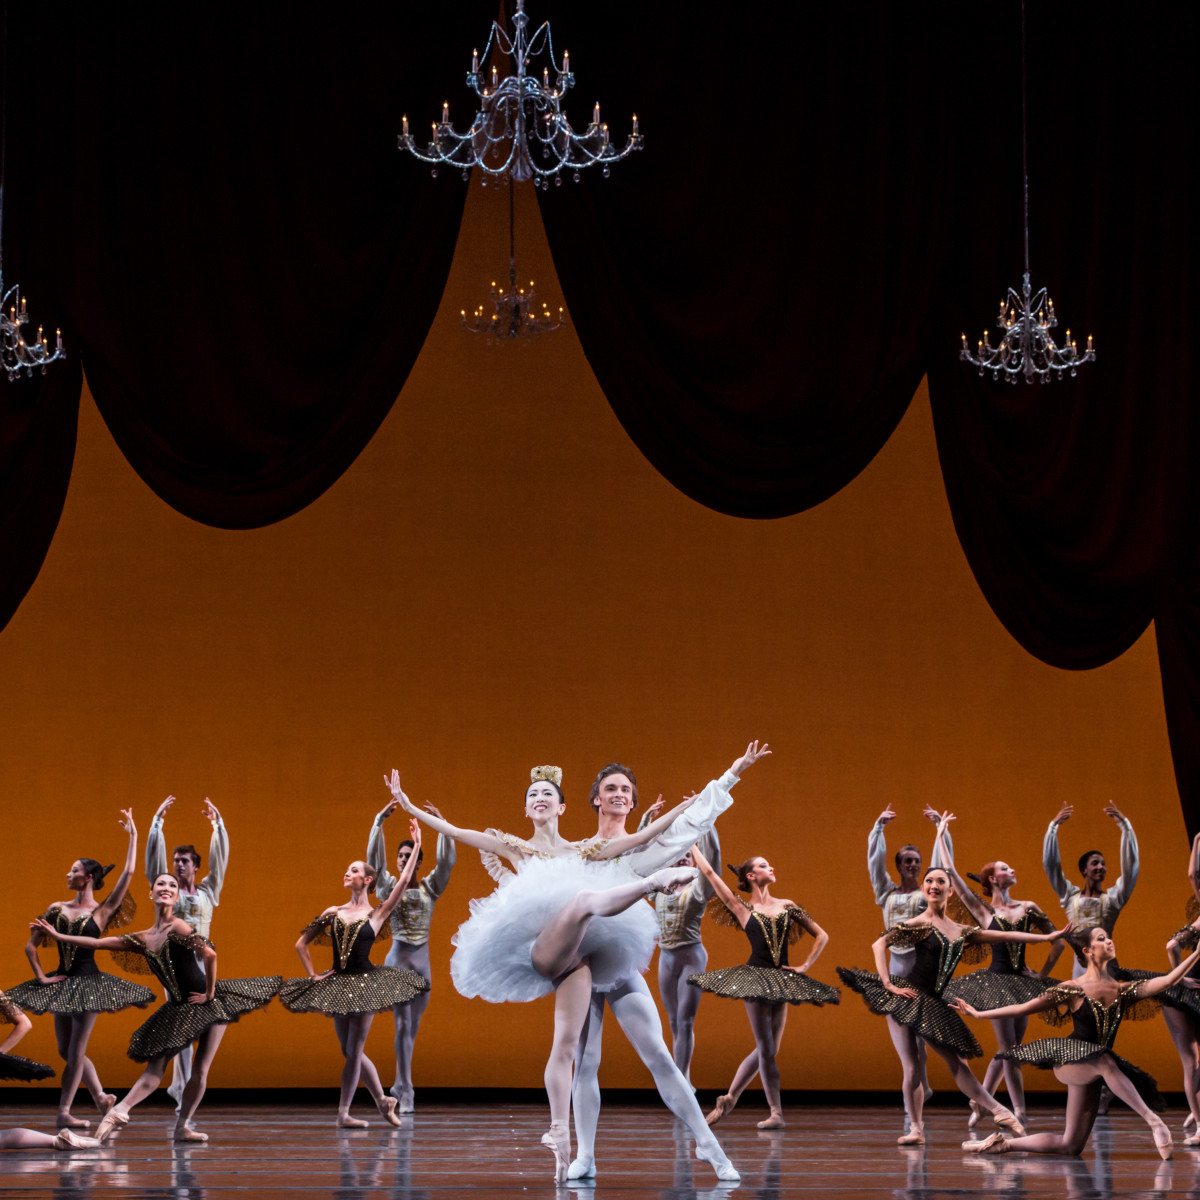 Houston Ballet principal Yuriko Kajiya and former Principal Jared Matthews with Artists of Houston Ballet in Stanton Welch's Paquita